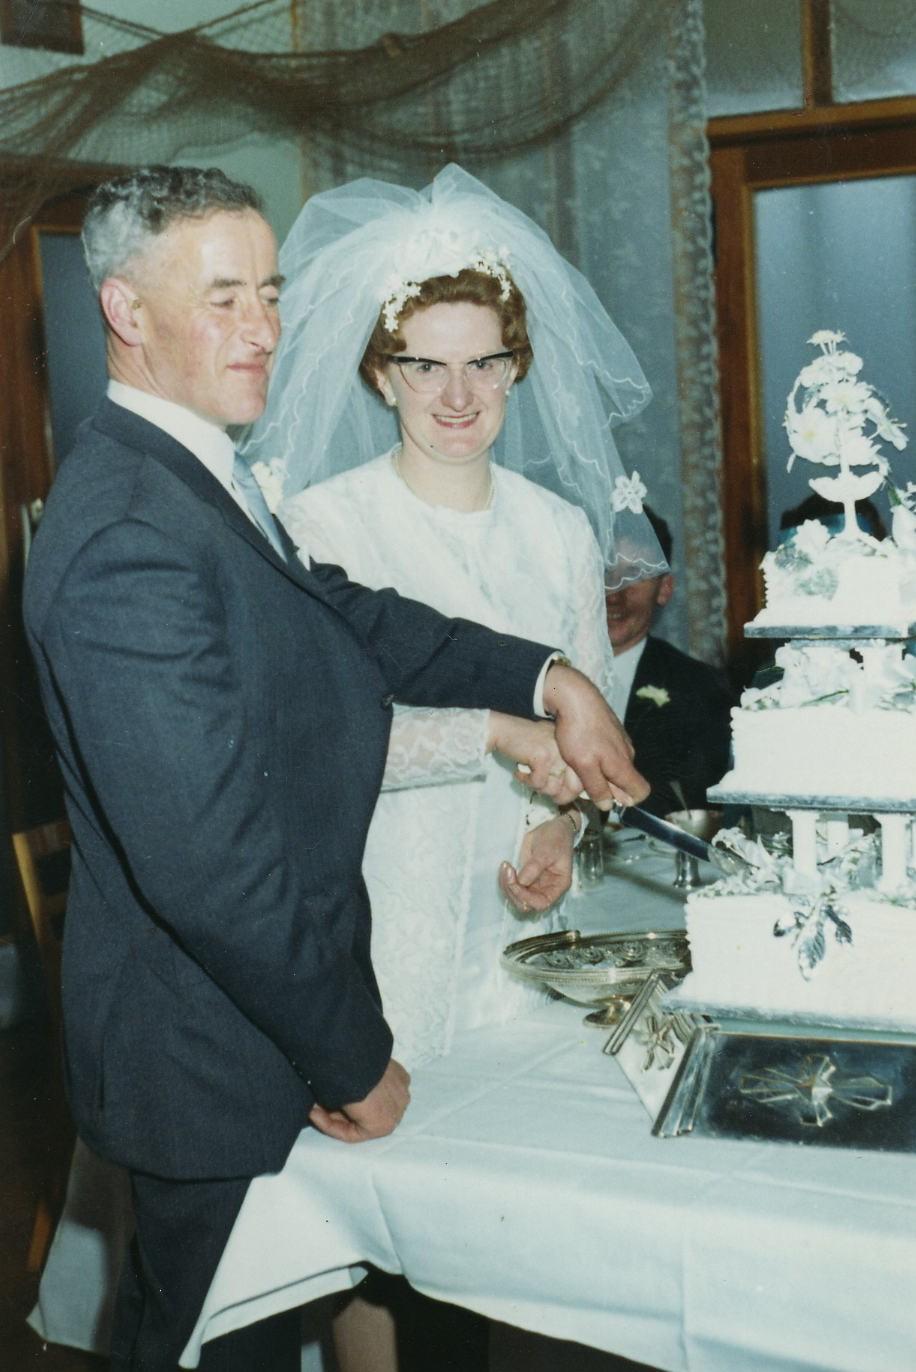 Peter McGregor & Ray McLearn's Wedding